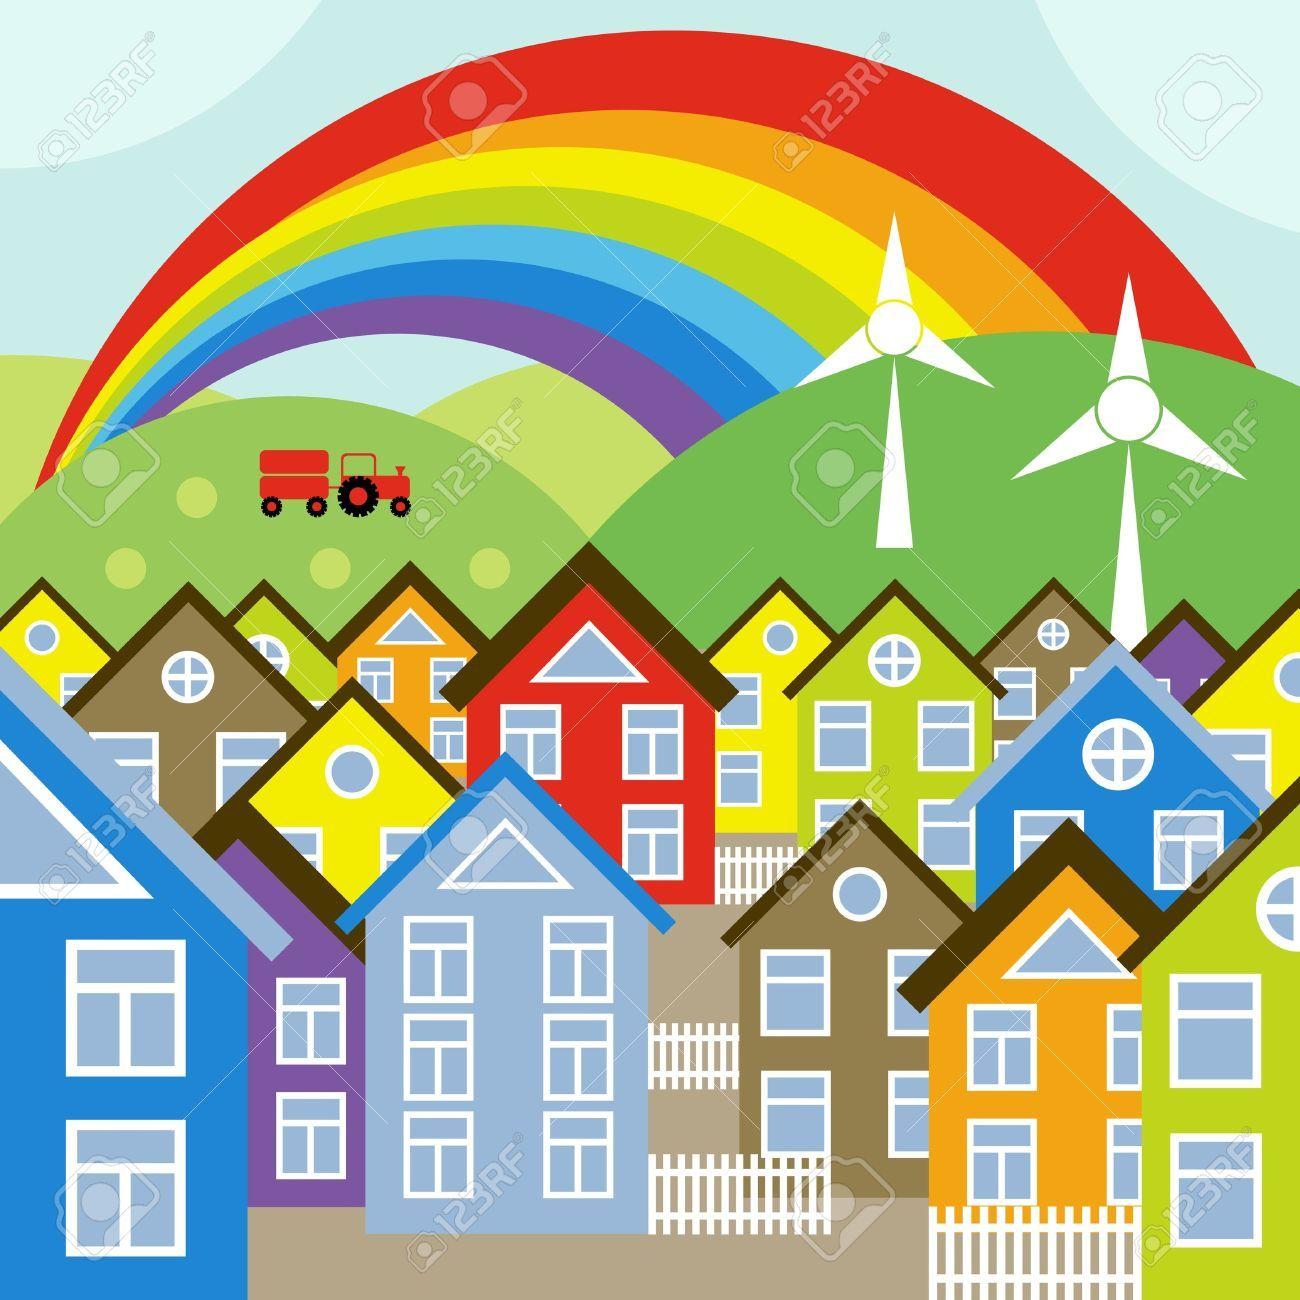 Neighborhood clipart neigborhood. Street cliparts stock vector